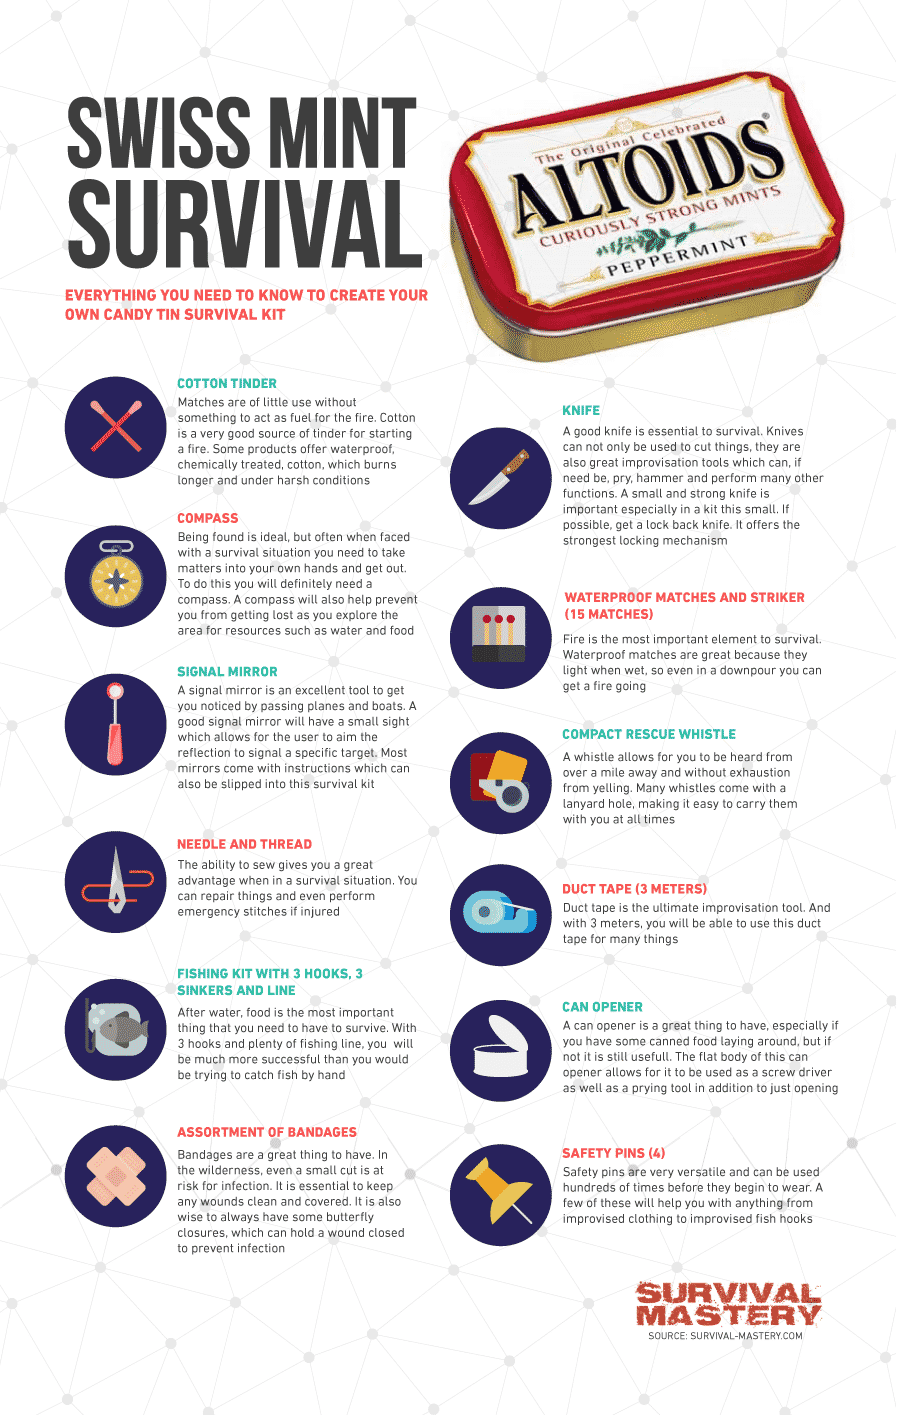 Swiss mint survival infographic